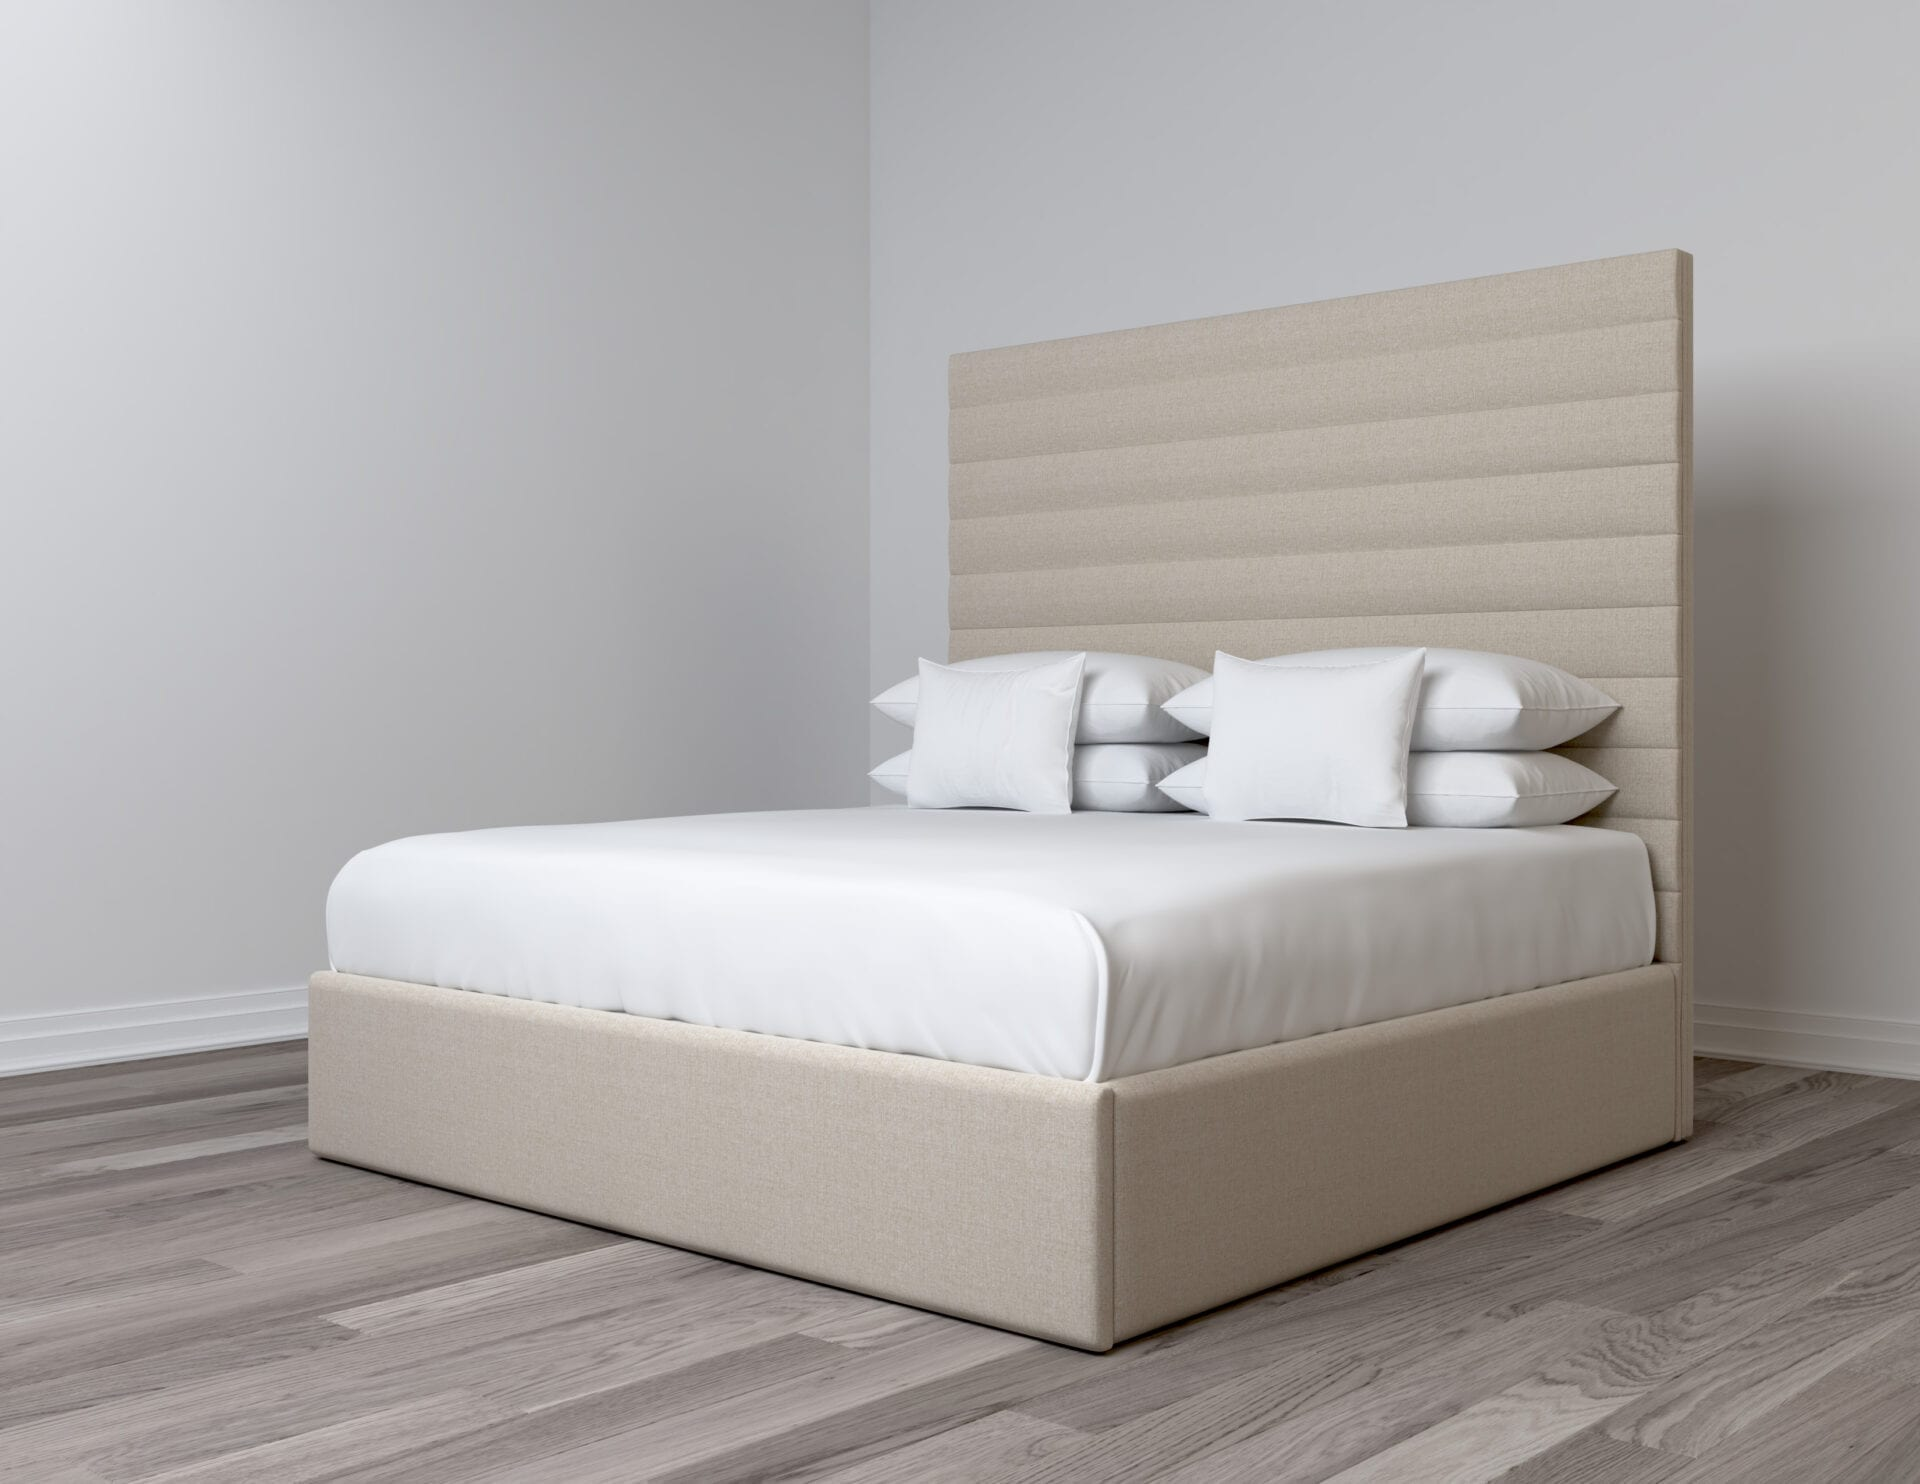 Ballard - Wall mounted upholstered, luxury headboard with custom upholstered wall panels - Custom luxury, upholstered beds with high end, bedroom textiles | Blend Home Furnishings